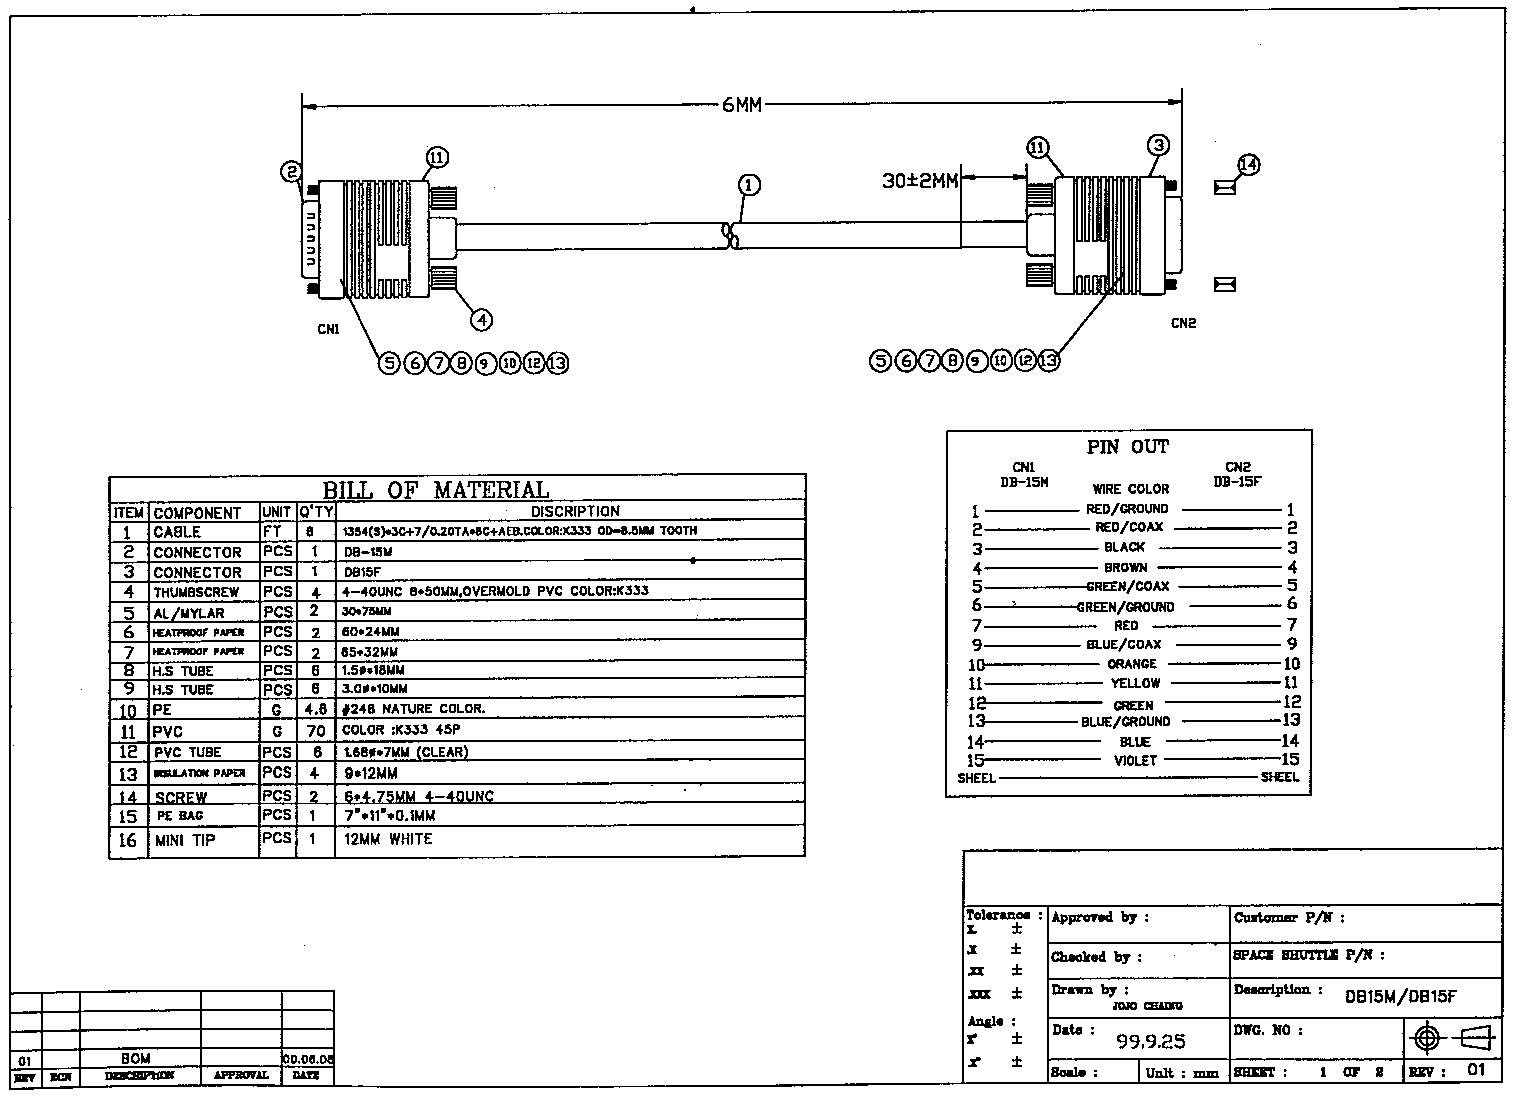 straight through serial cable wiring diagram brown bear cc382 100 100ft db15 male to female thru rgb